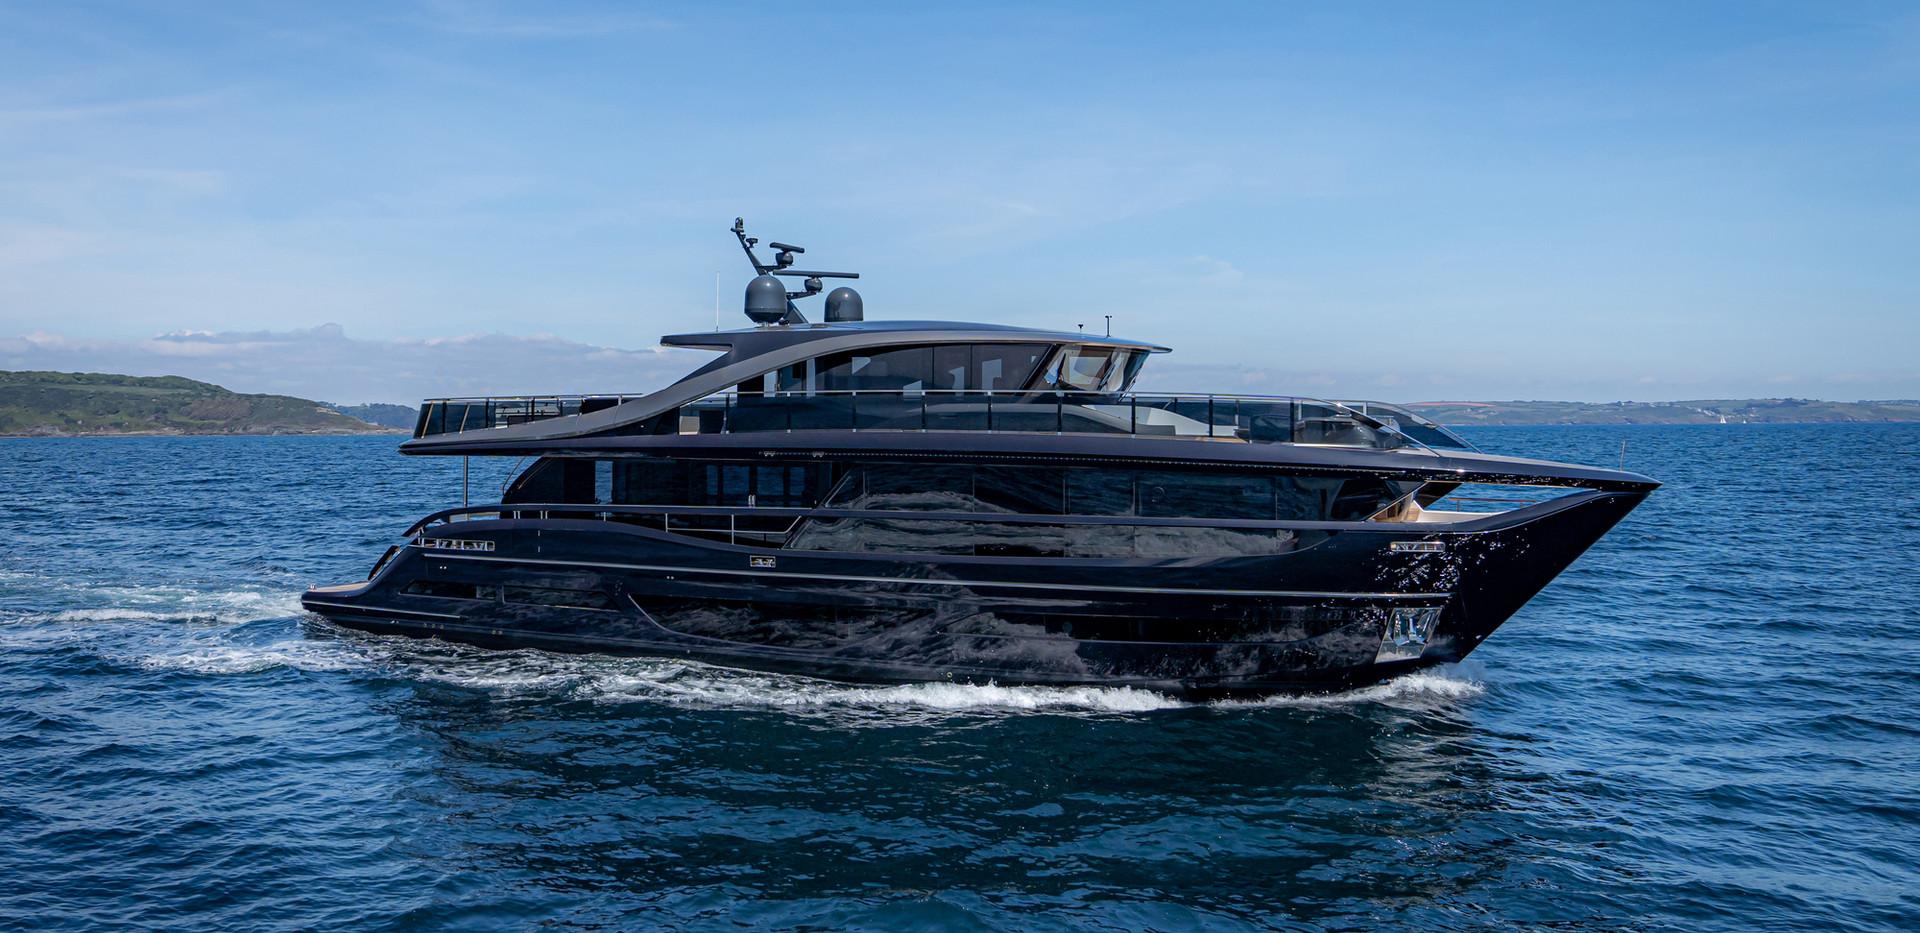 x95-exterior-blue-hull-sea-trial-1.jpg